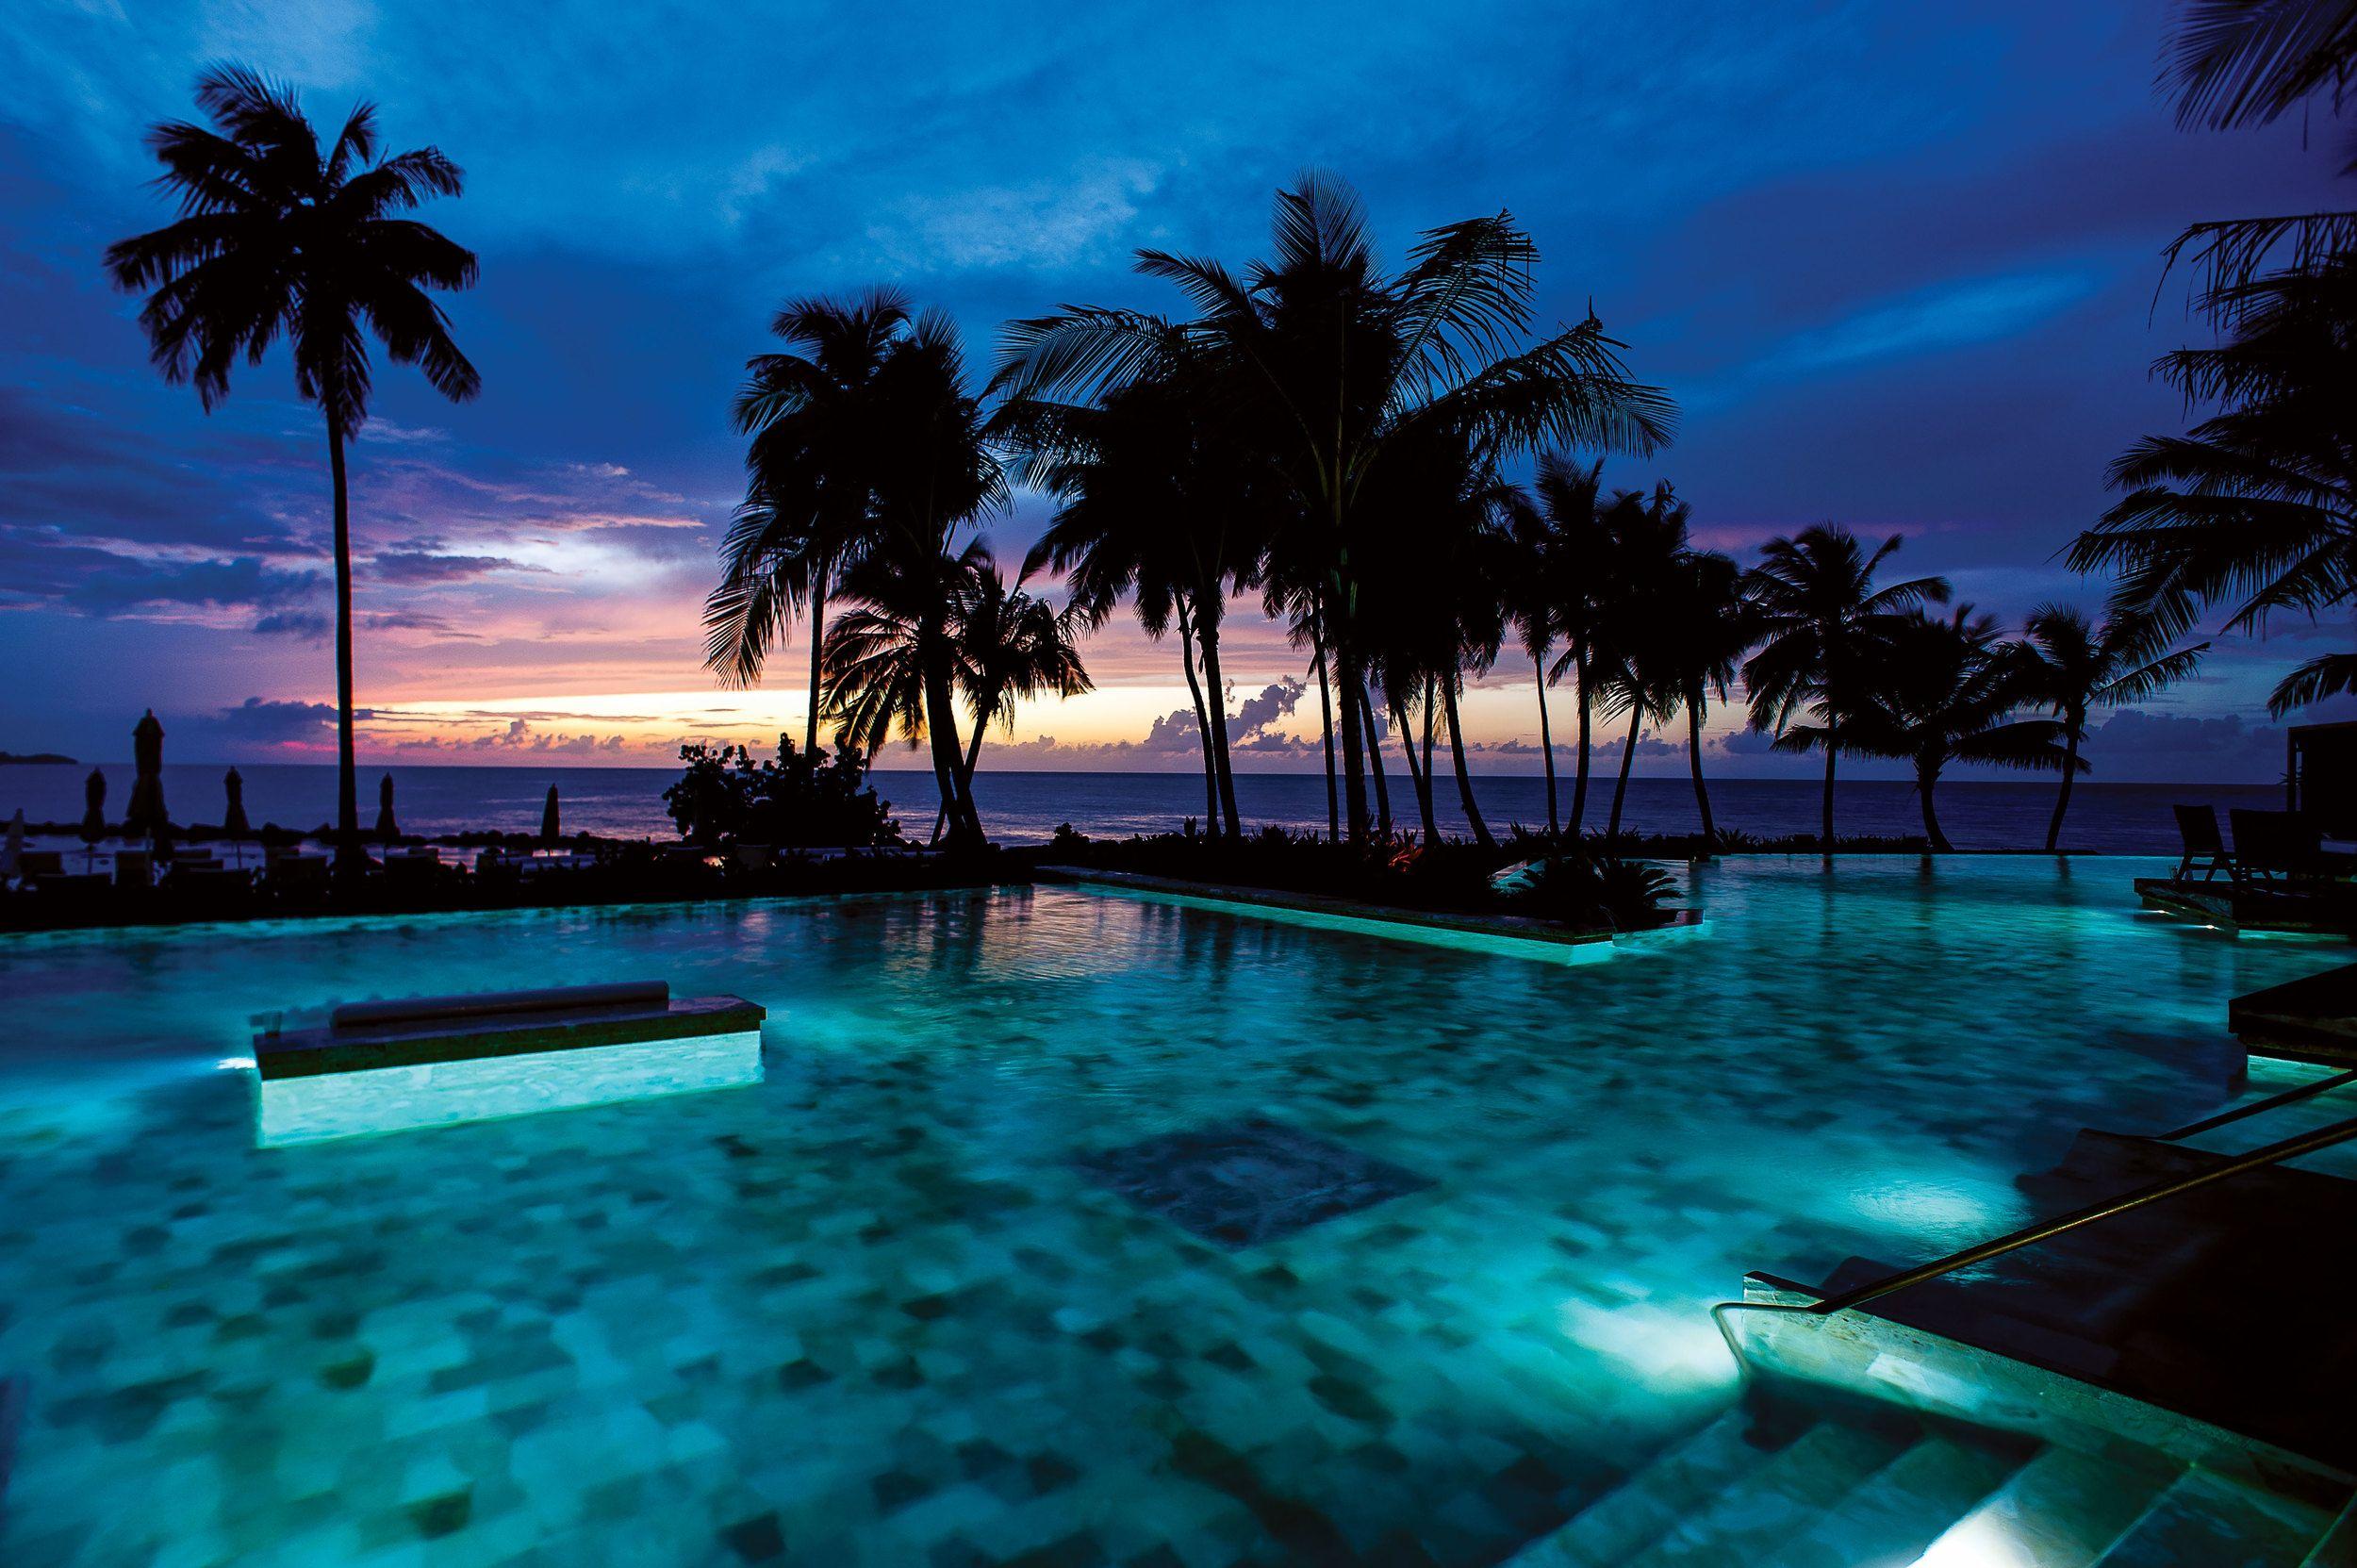 puerto rico night wallpaper desktop background | landscape